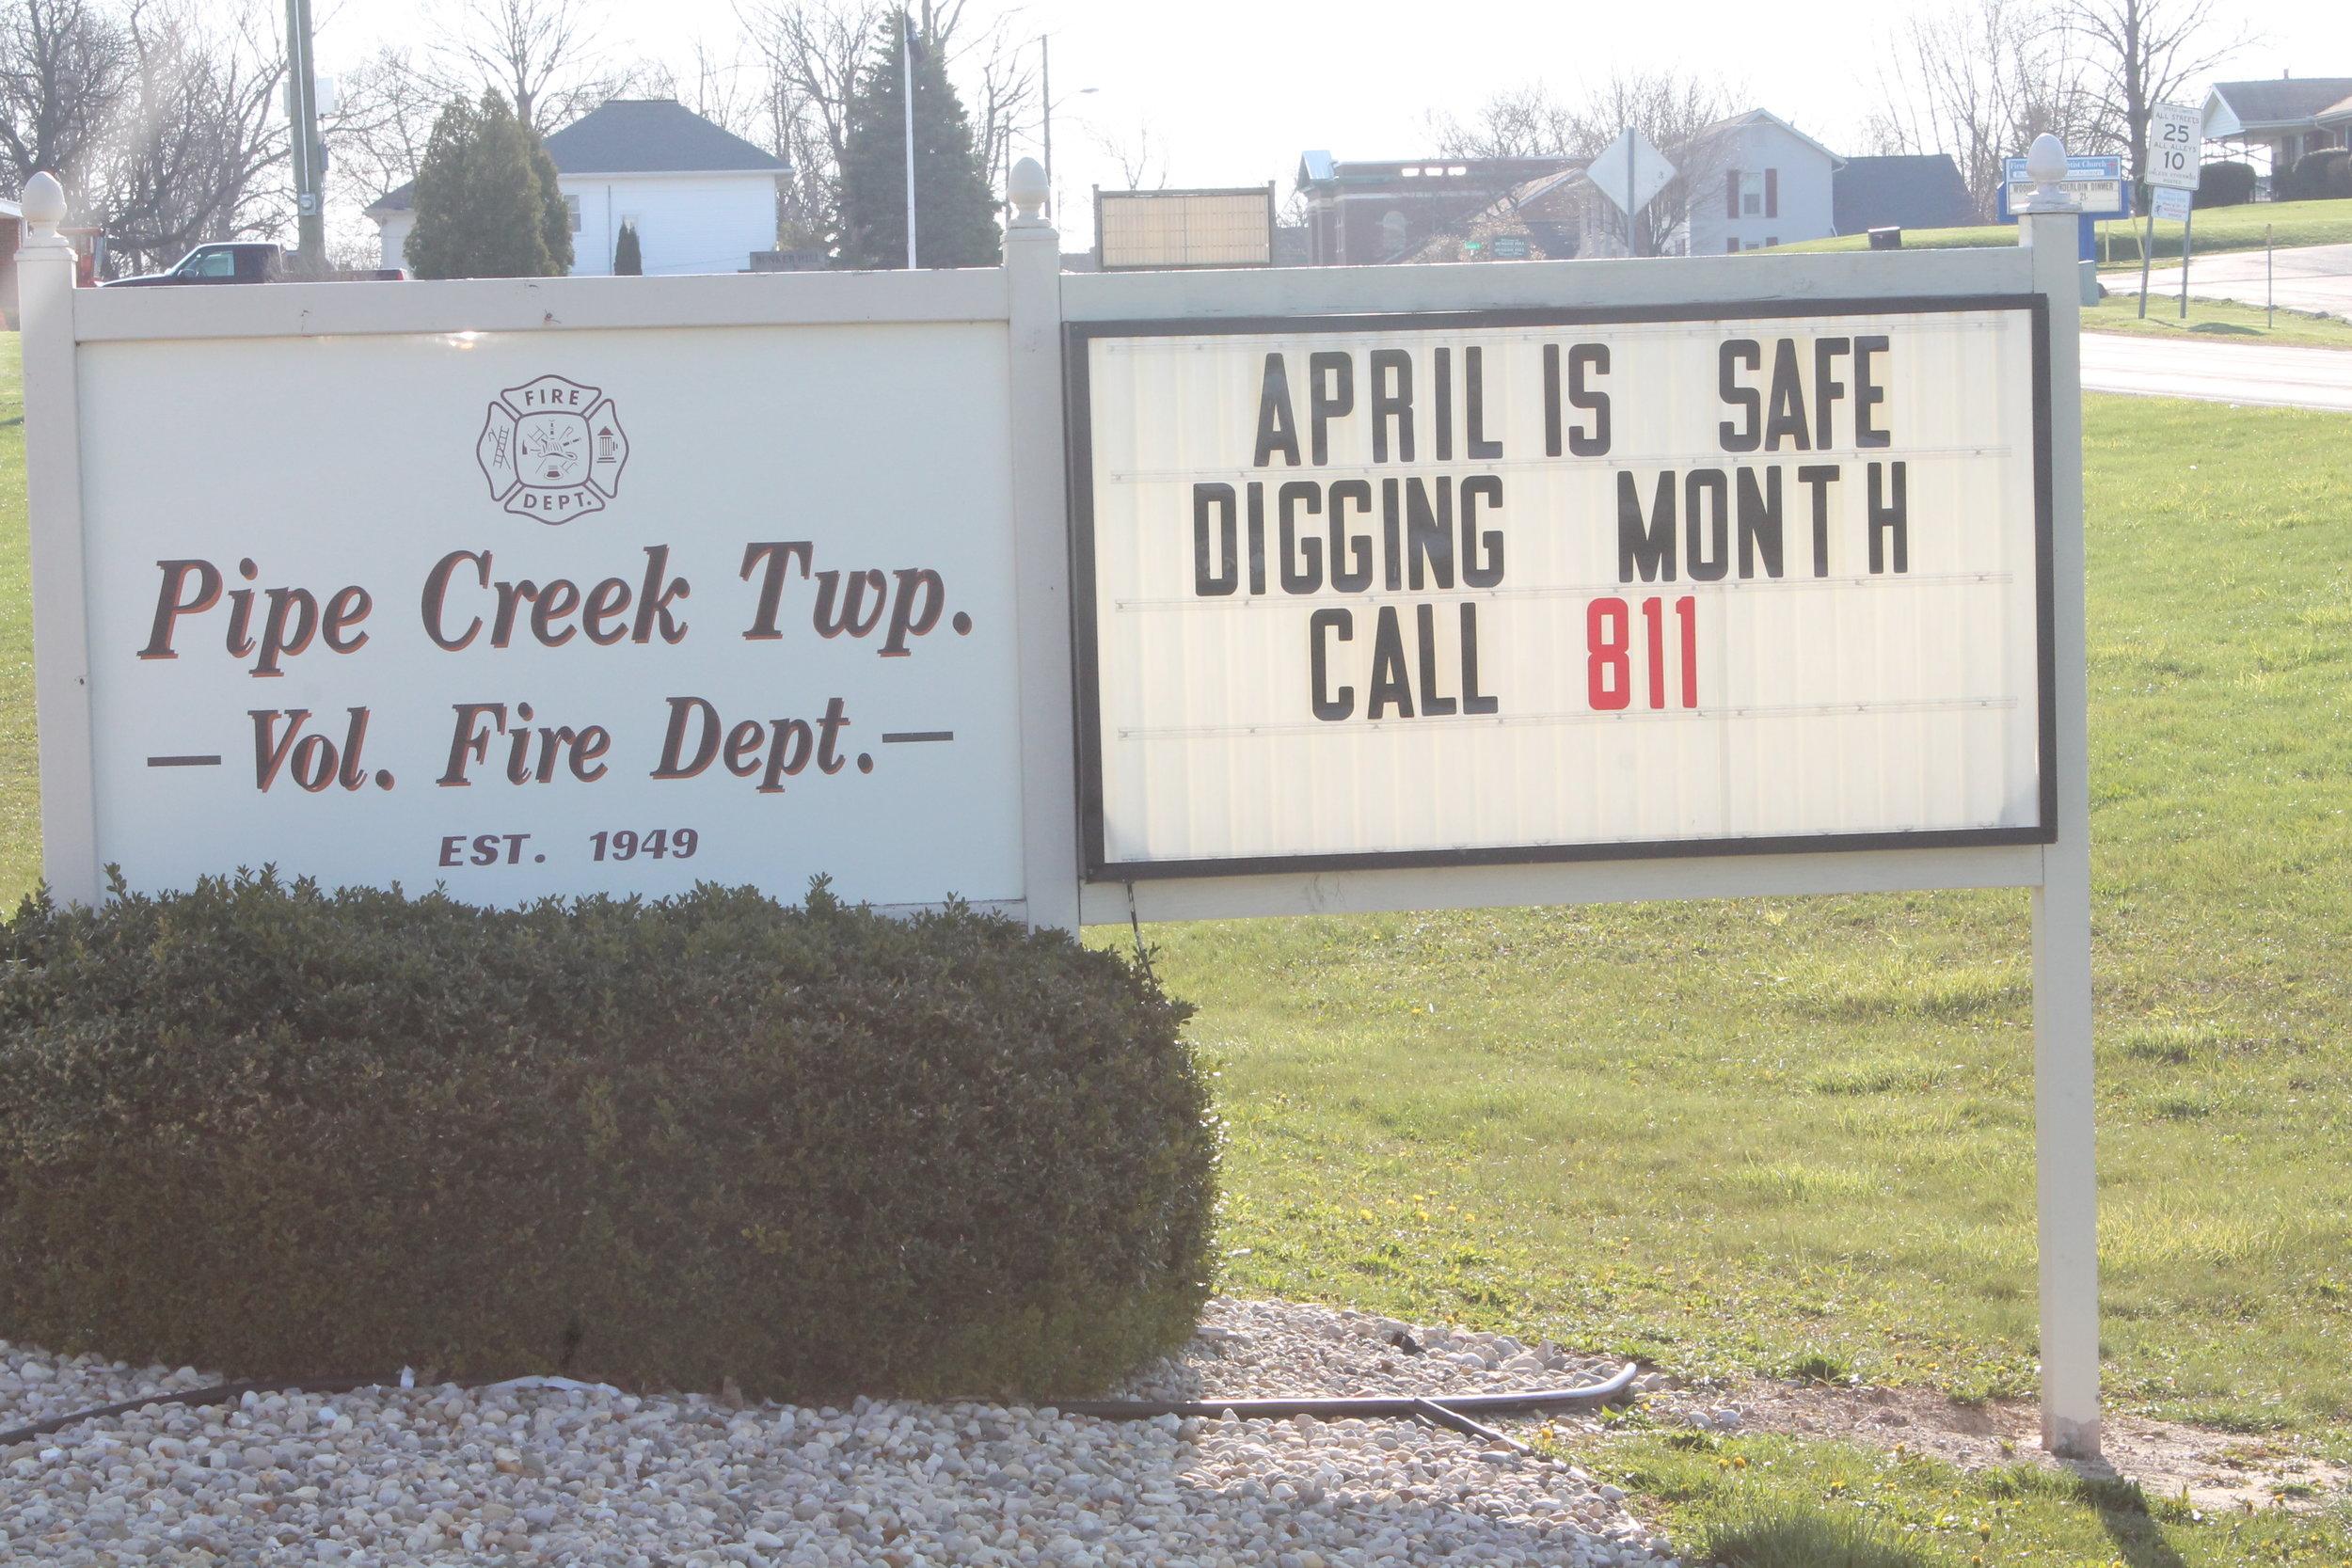 Pipe Creek Twp. Vol. Fire Department